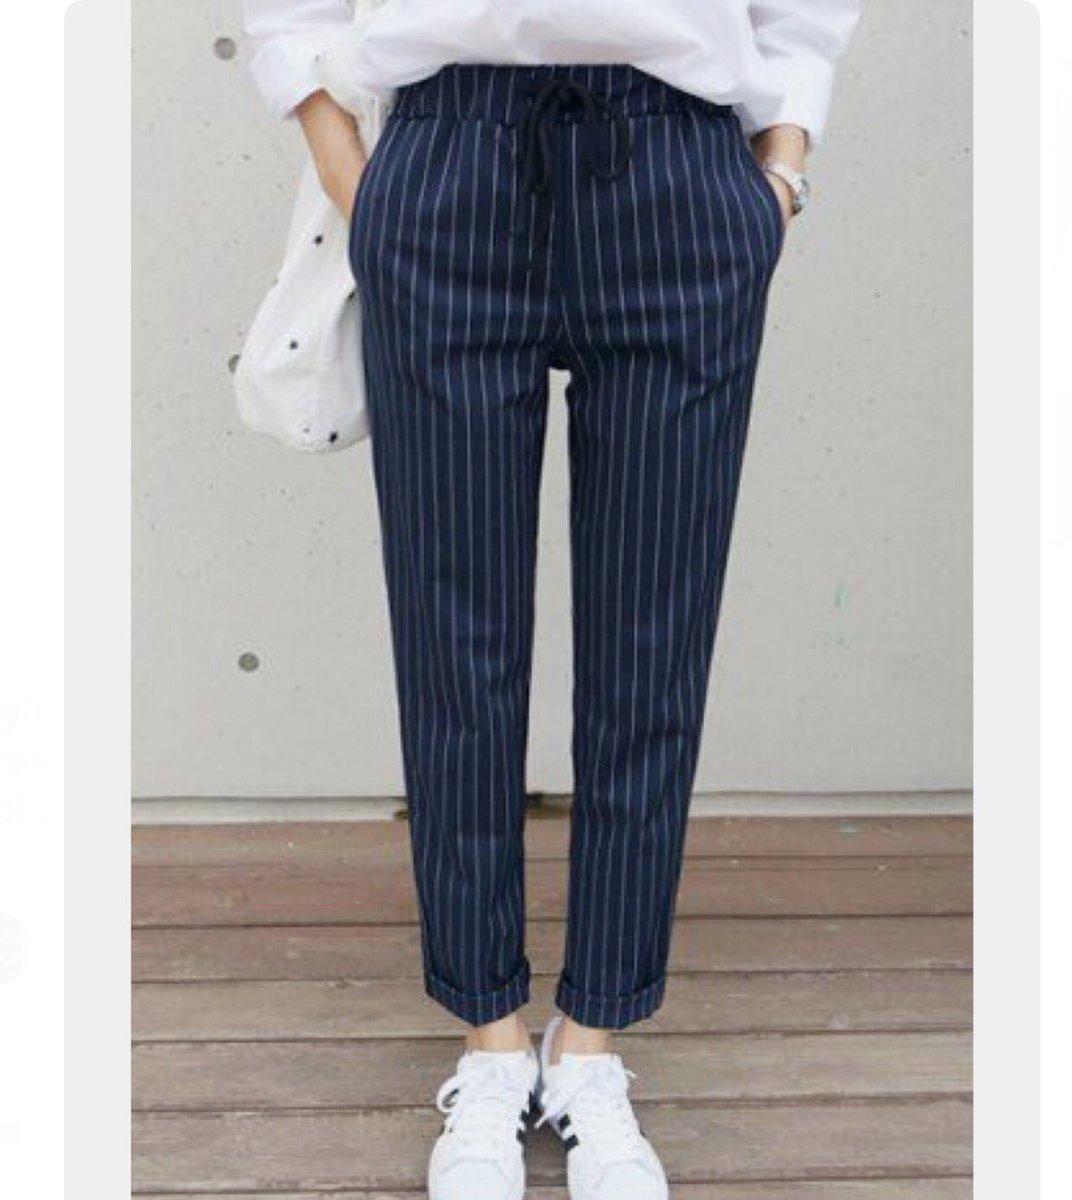 Wejdan Fashion Pa Twitter أنواع التنانير A Line Skirt تنورة شكلها يشبه حرف ال A تكون ضيقة من الخصر او تحت البطن وواسعة جدا من الأسفل